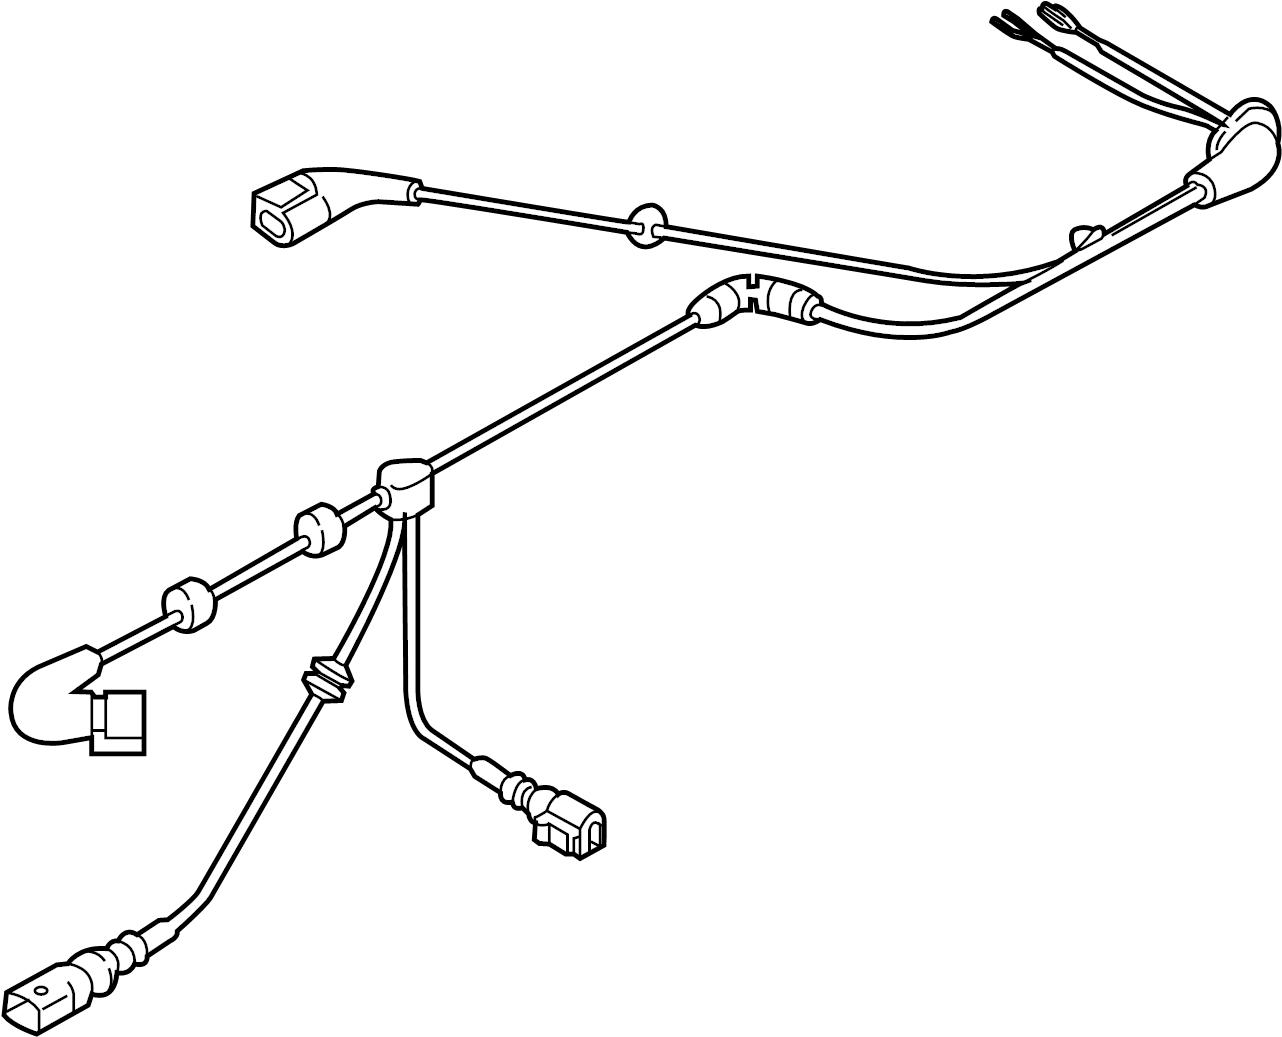 Volkswagen GTI Abs wheel speed sensor wiring harness